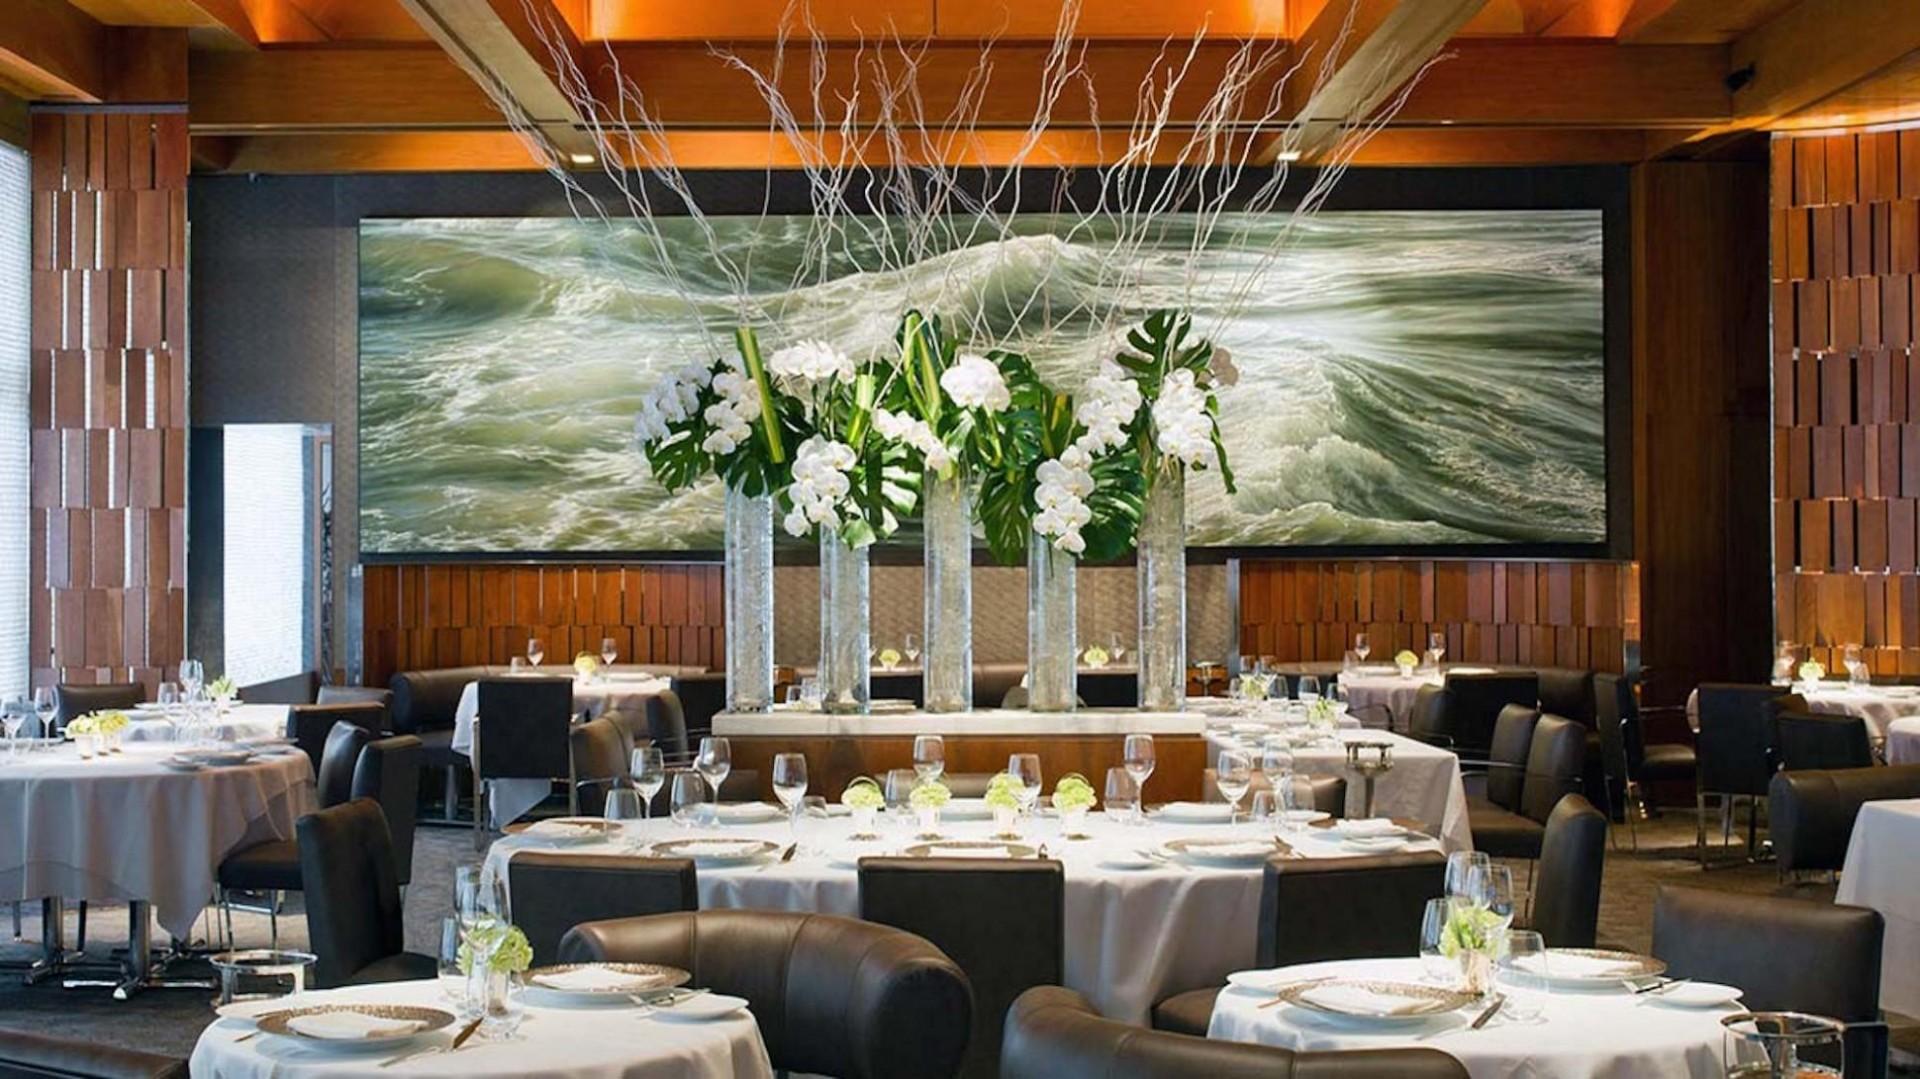 michelin-star-restaurants-new-york_01-1940x1091.jpg